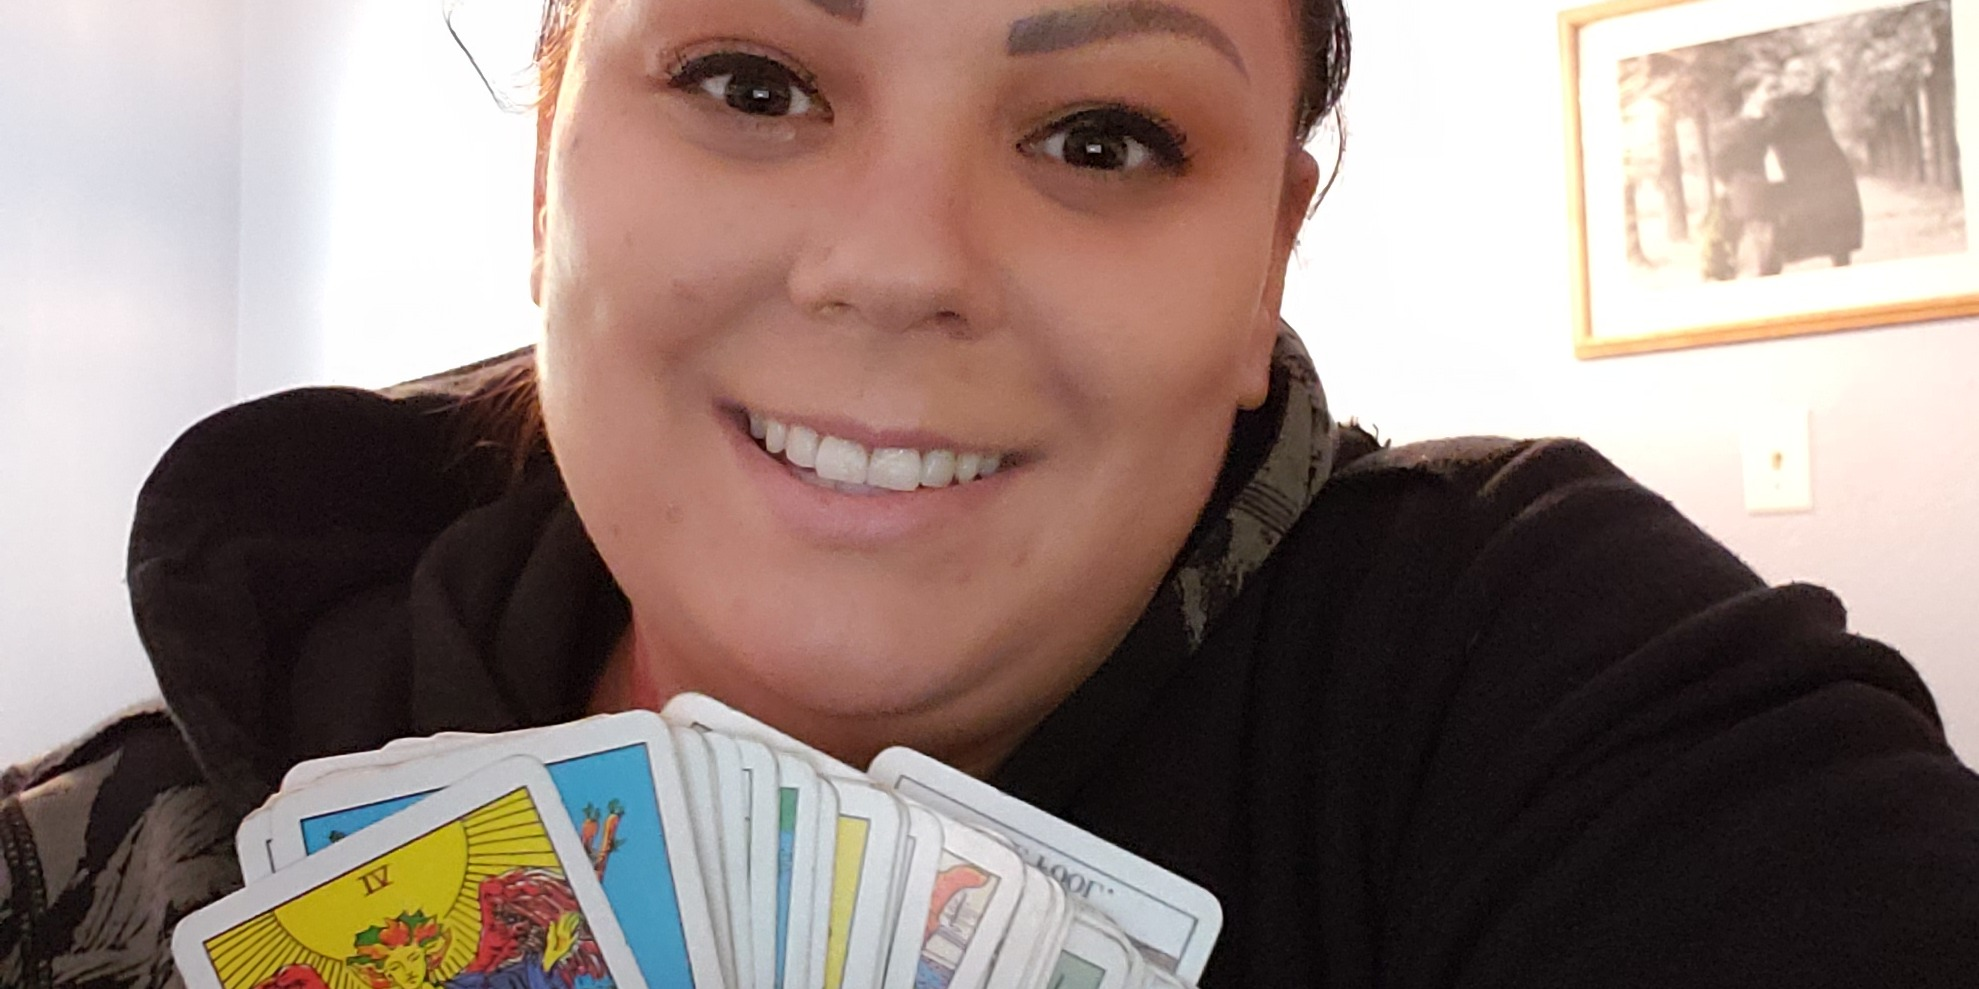 Miss Paloma